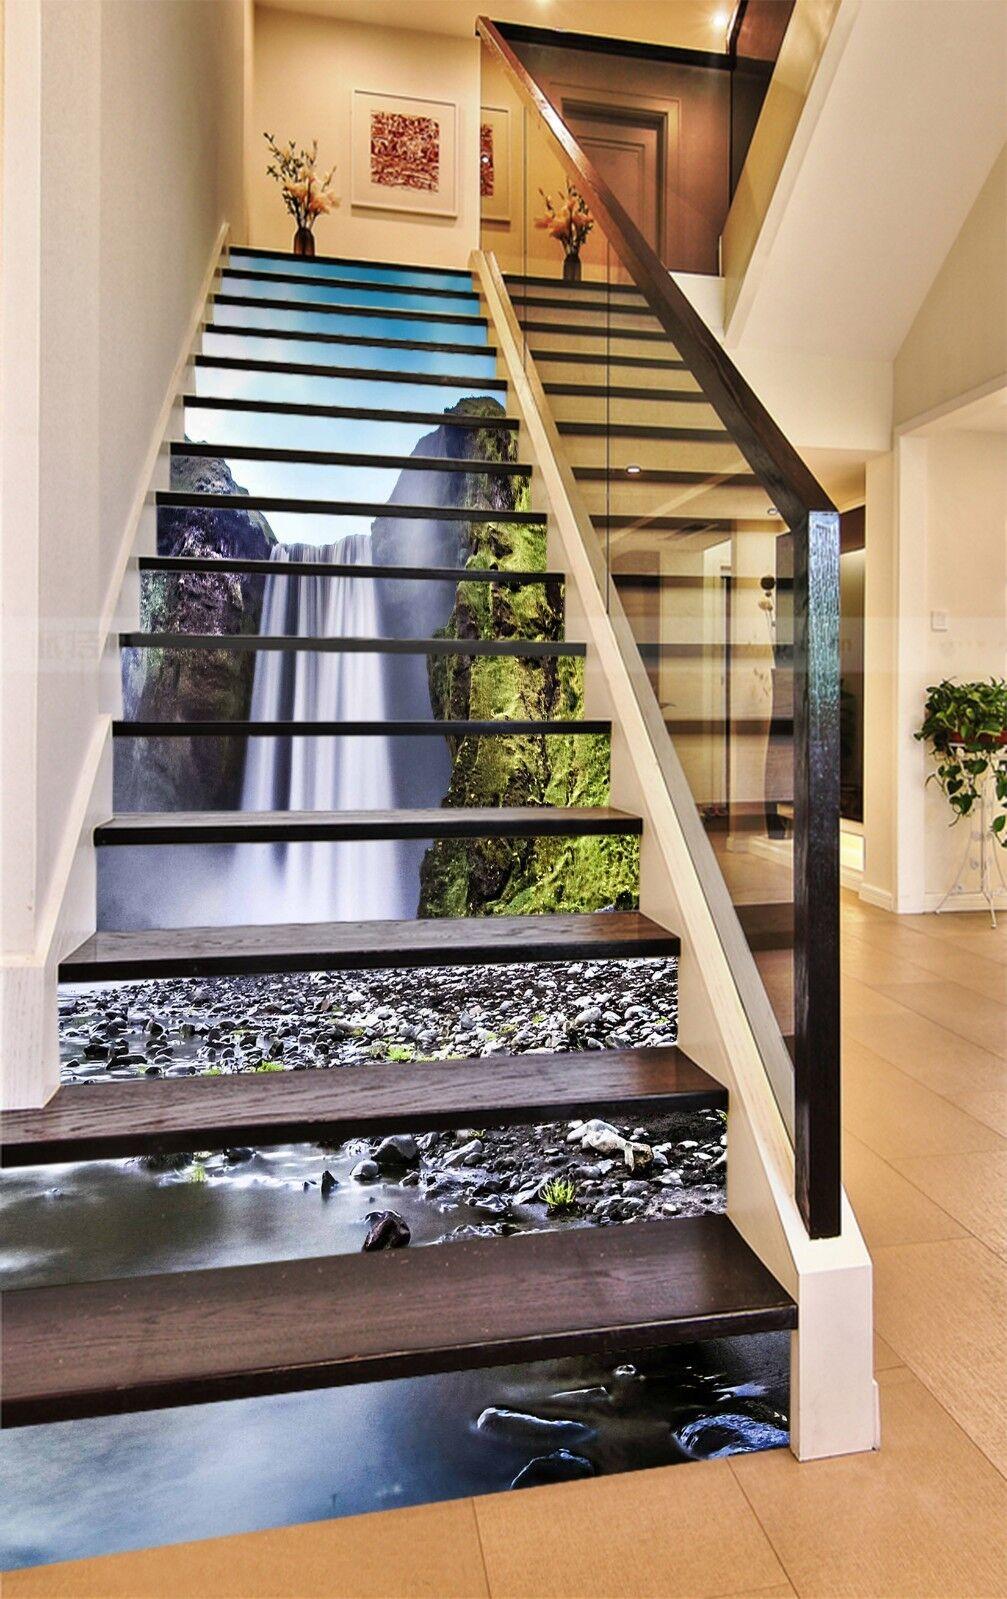 3D Waterfall 25 Stair Risers Decoration Photo Mural Vinyl Decal Wallpaper UK